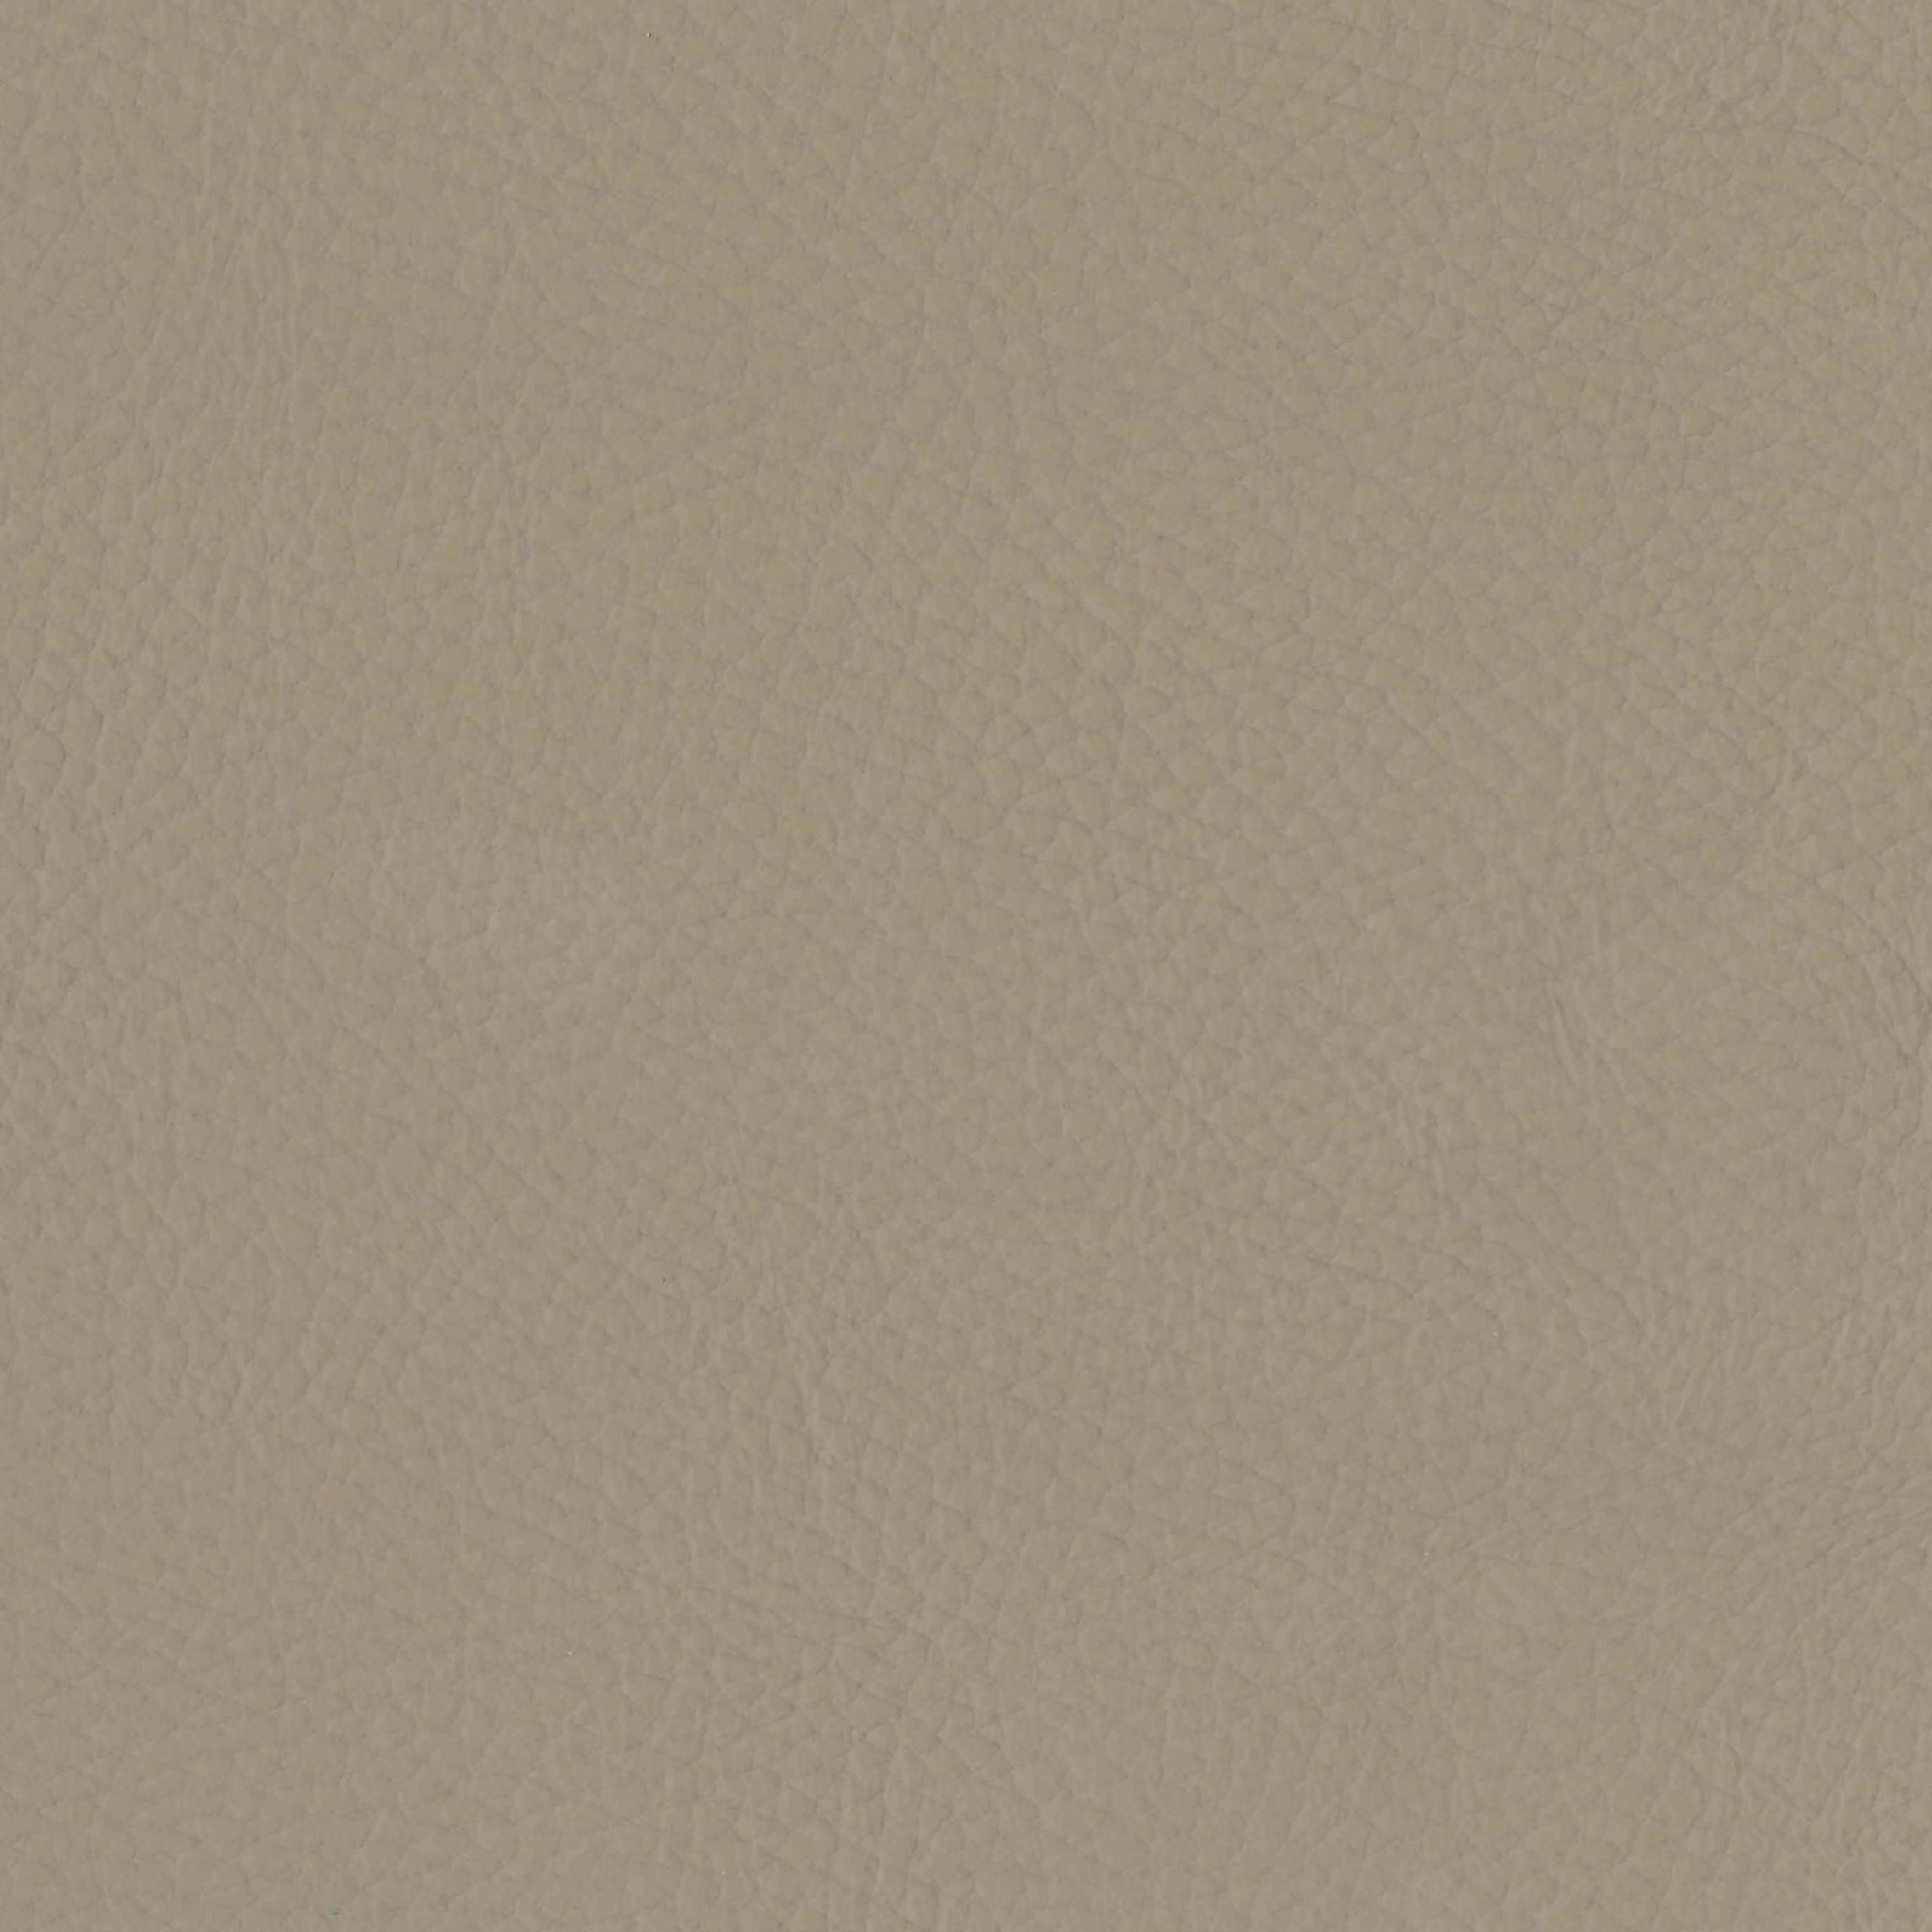 Yarwood Leather Style Putty